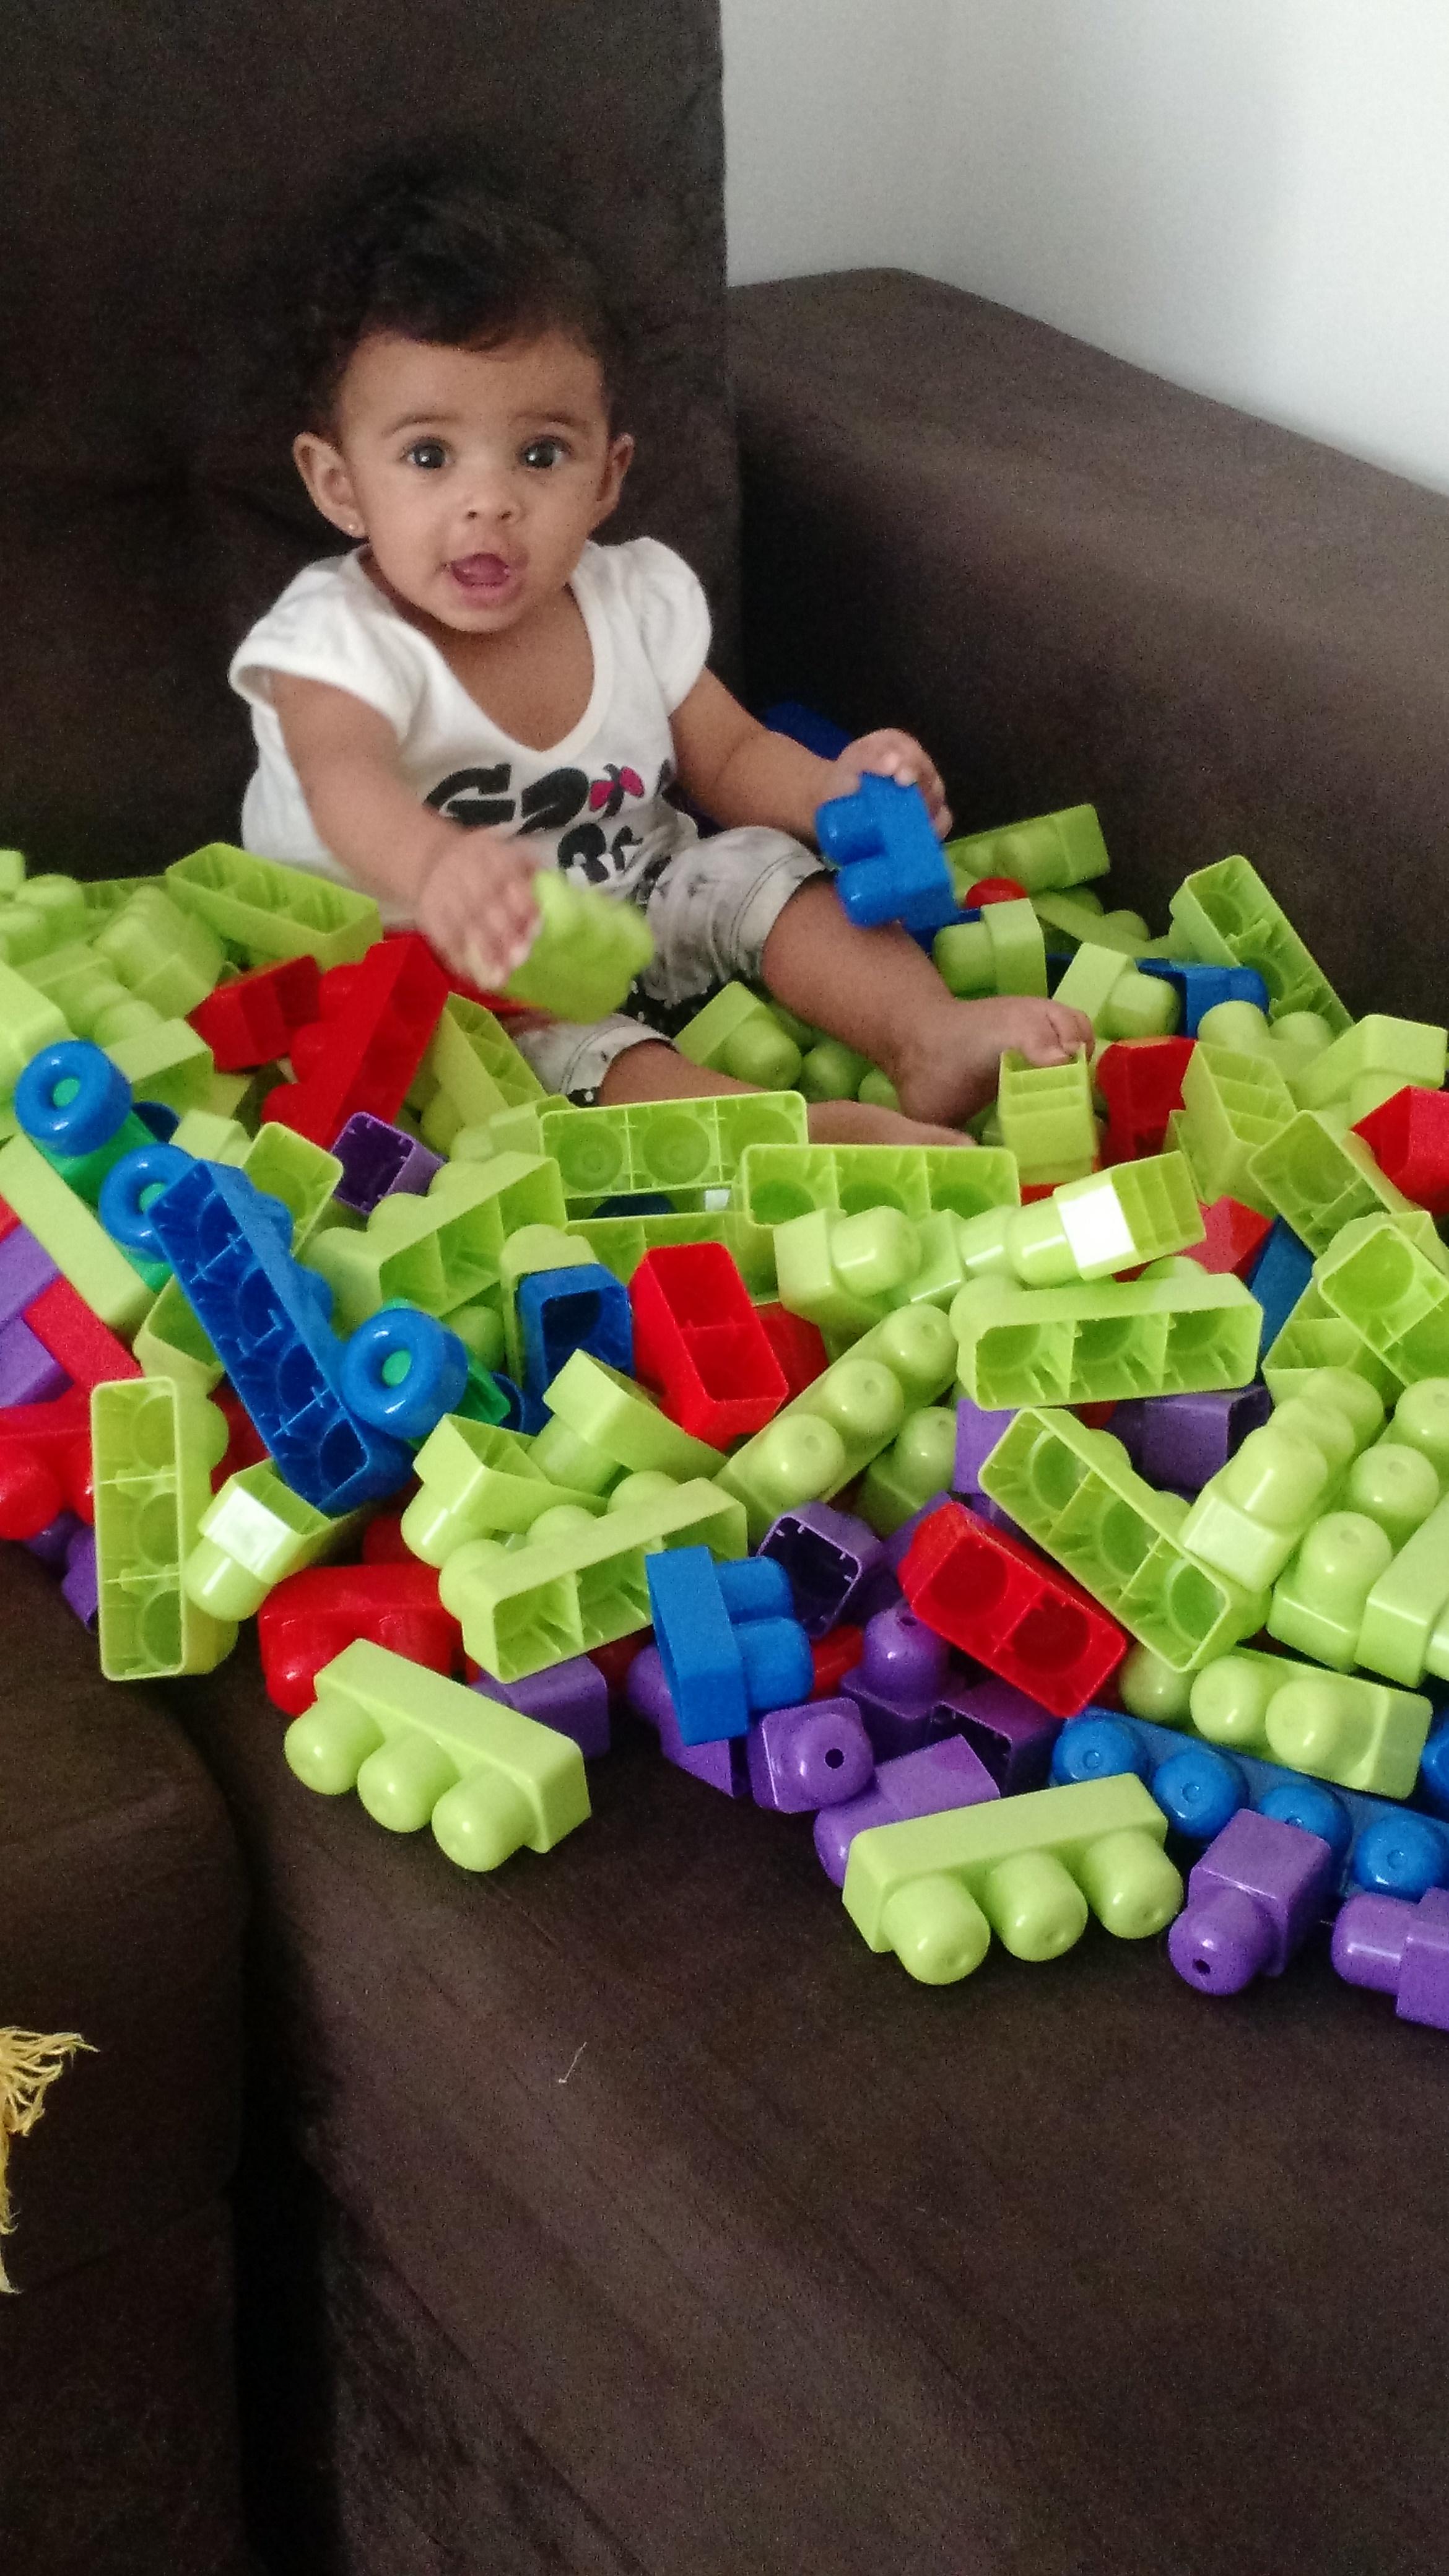 Dicas De Presentes | Vitrine De Natal Dismat Brinquedos Blocos